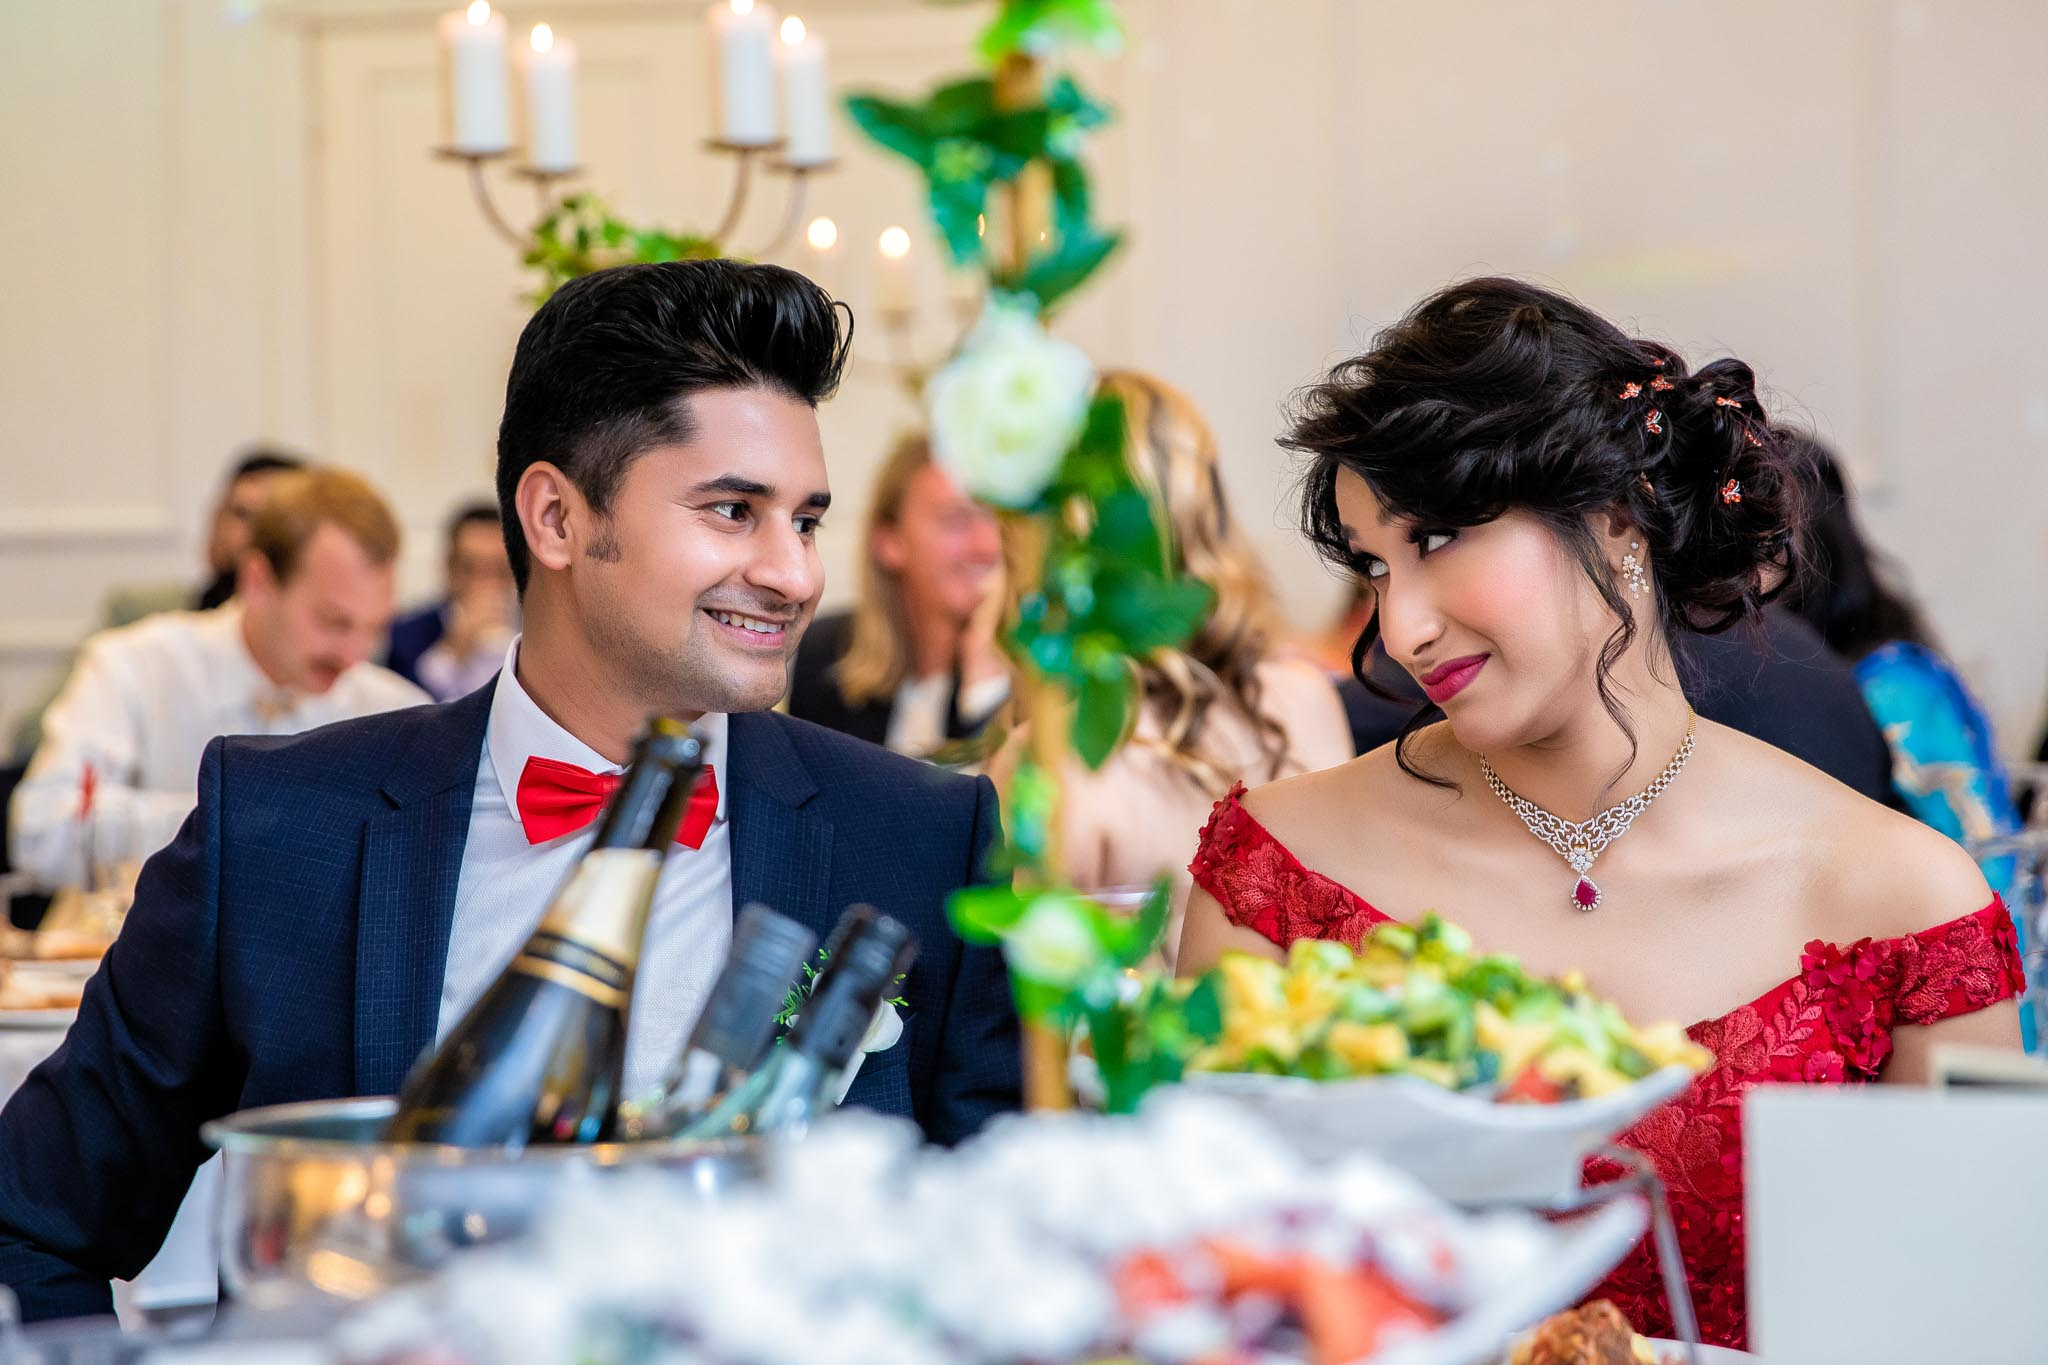 Best-of-2018-wedding-photography-focuz-studios-63